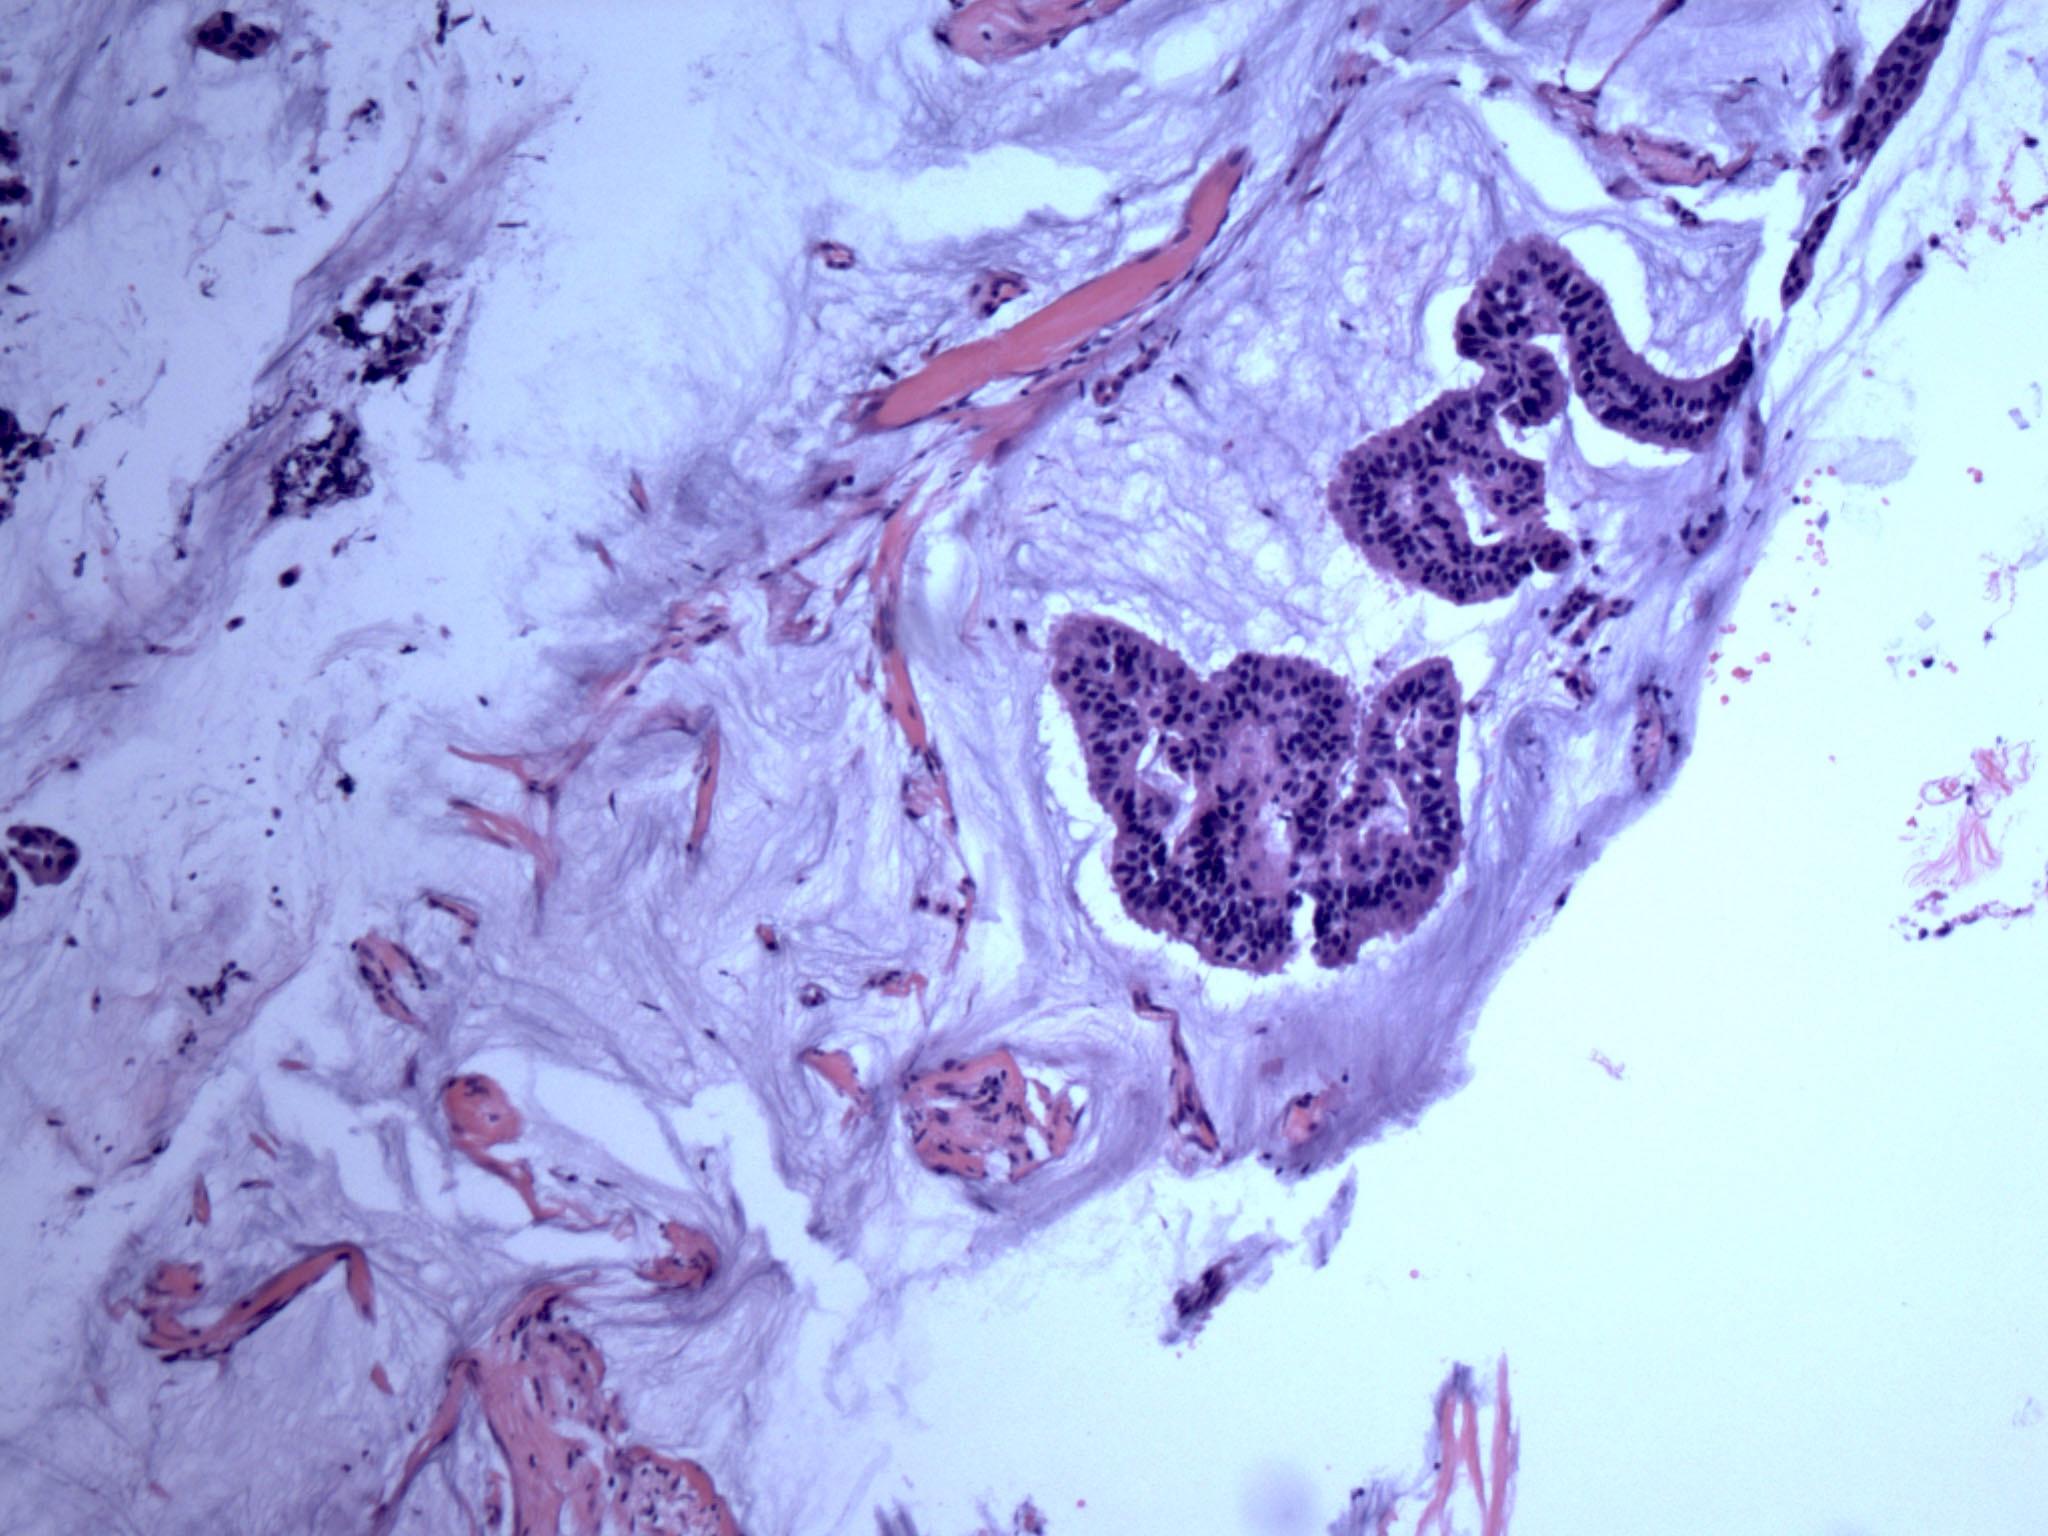 Mucinous micropapillary carcinoma